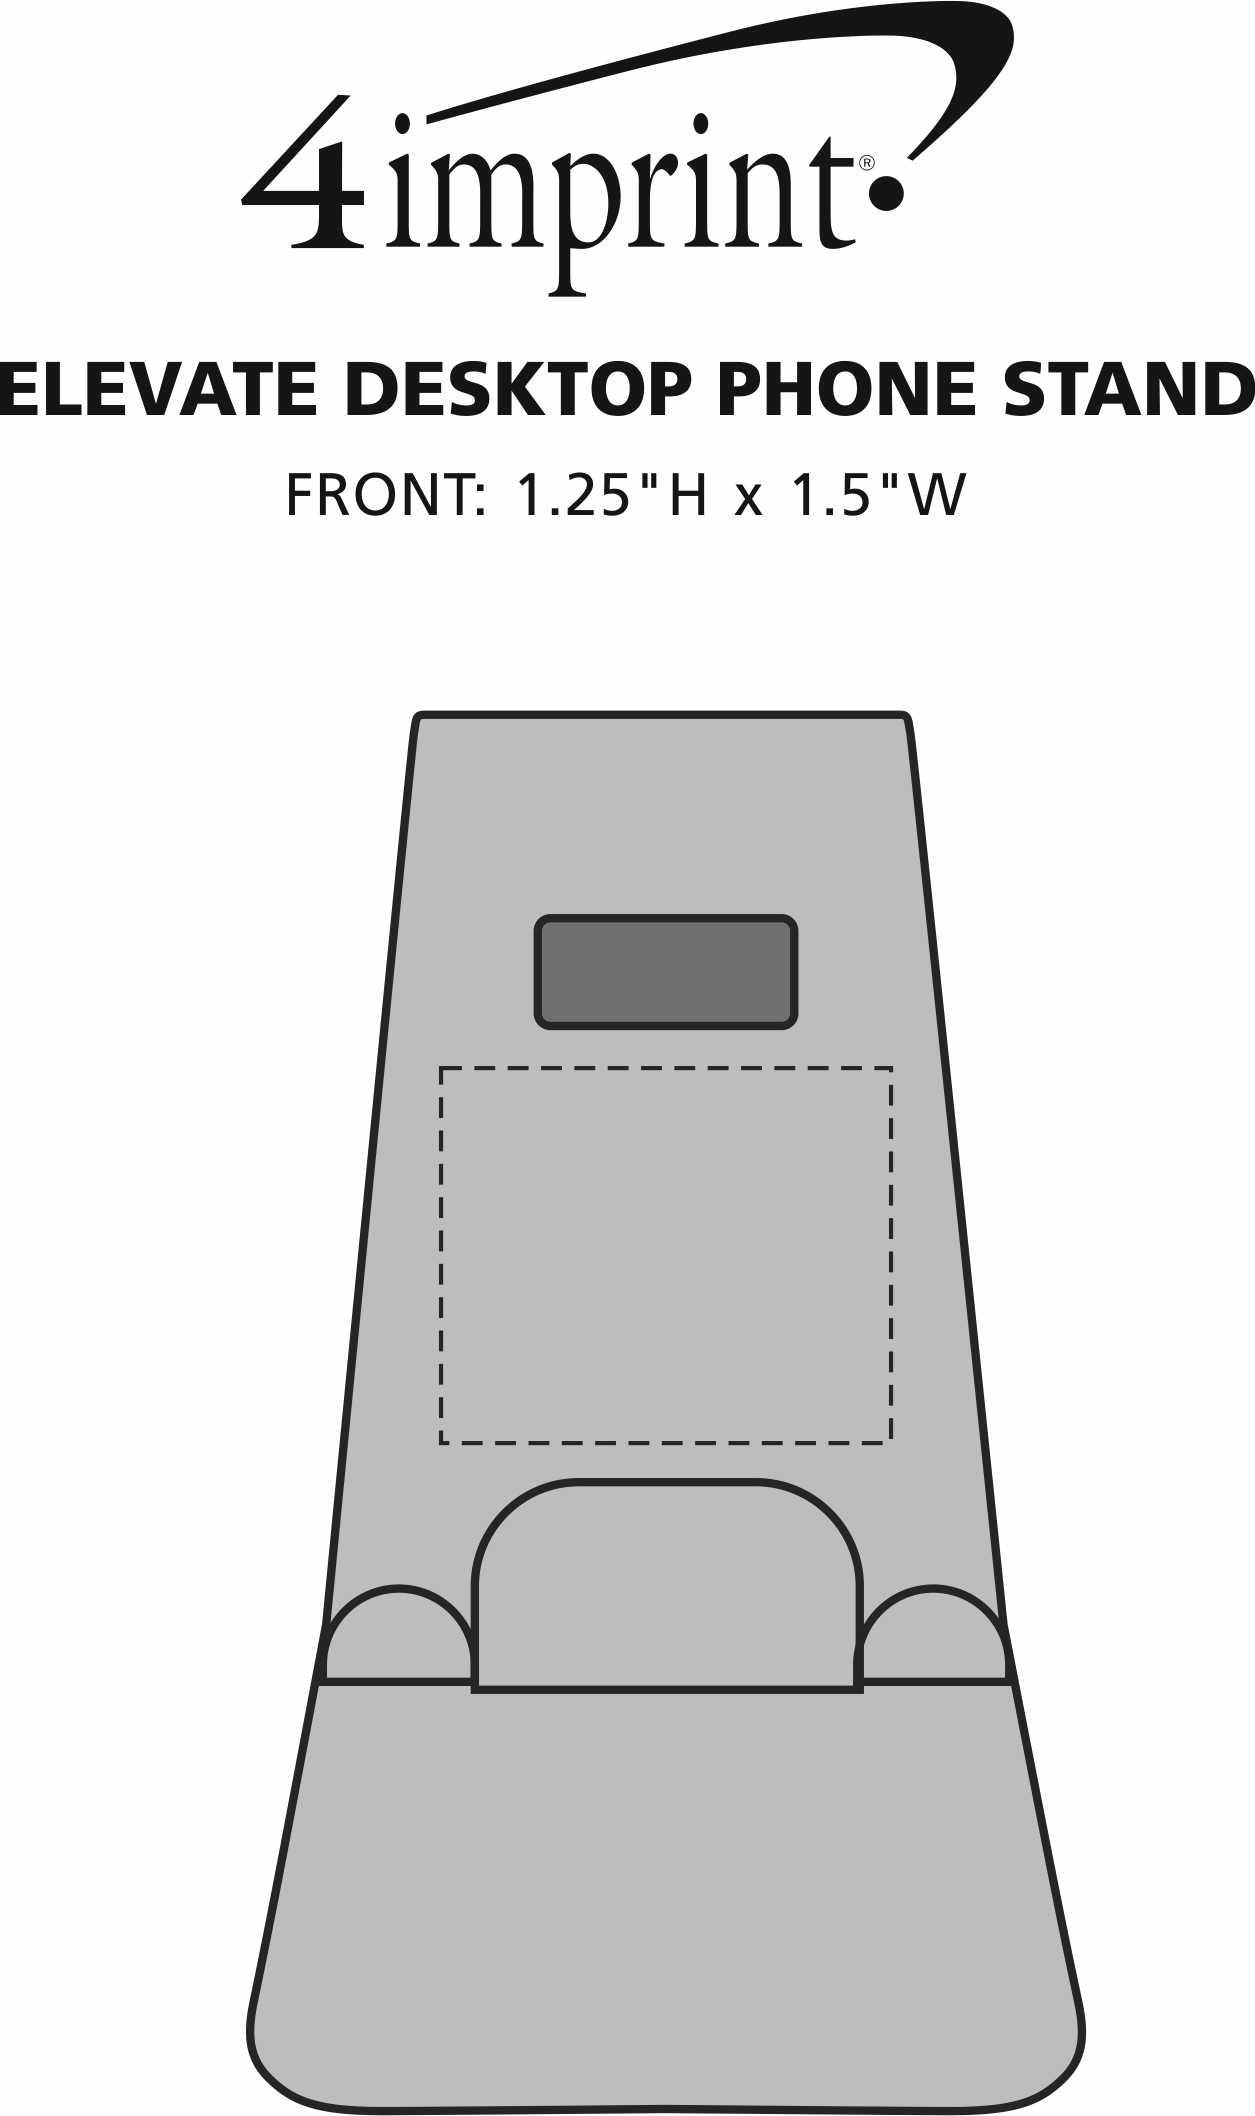 Imprint Area of Elevate Desktop Phone Stand